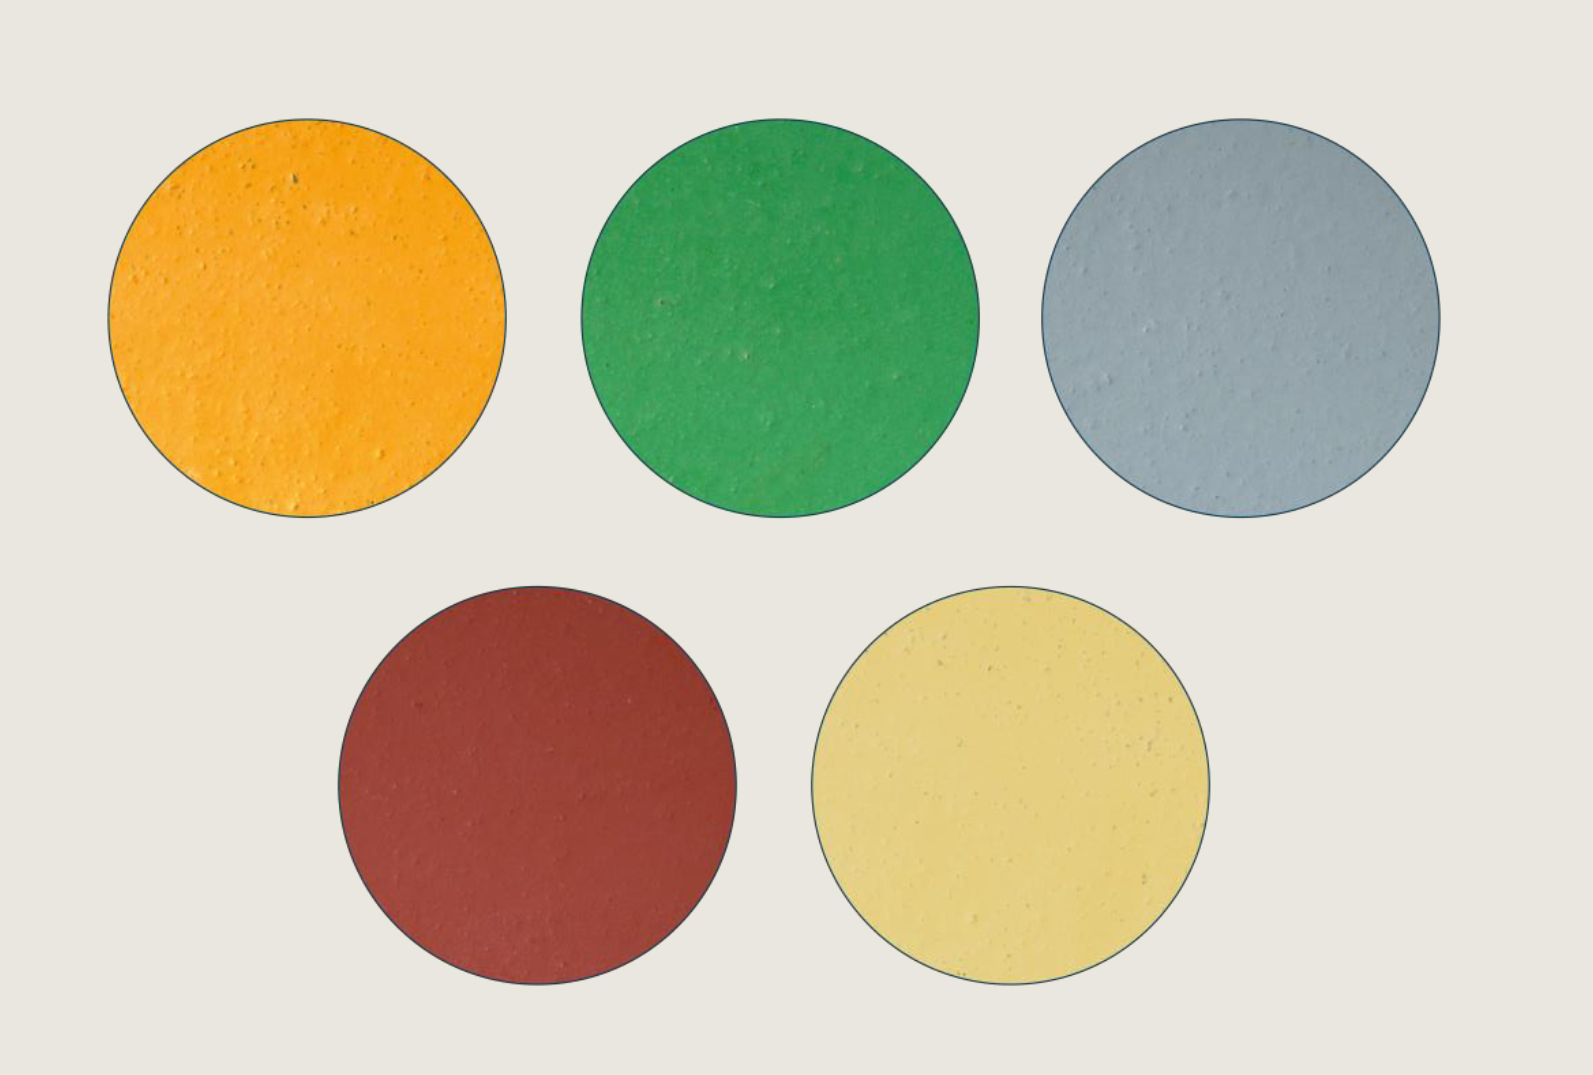 Kolory posadzki poliureatnowo-cementowej